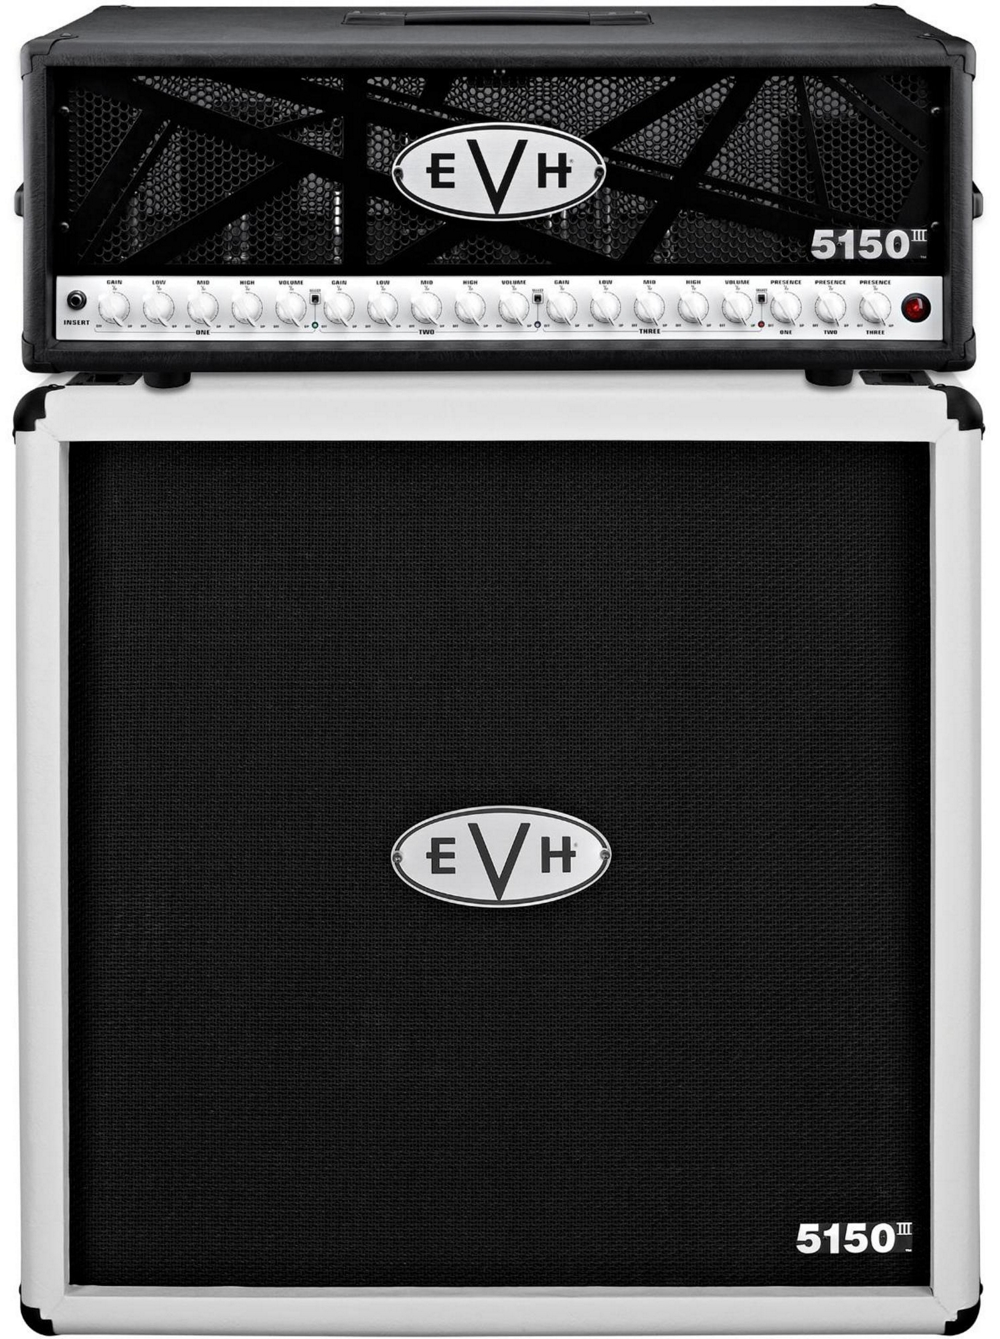 evh 5150 iii 100w guitar tube head black with 5150 iii 412 guitar cab ivory ebay. Black Bedroom Furniture Sets. Home Design Ideas